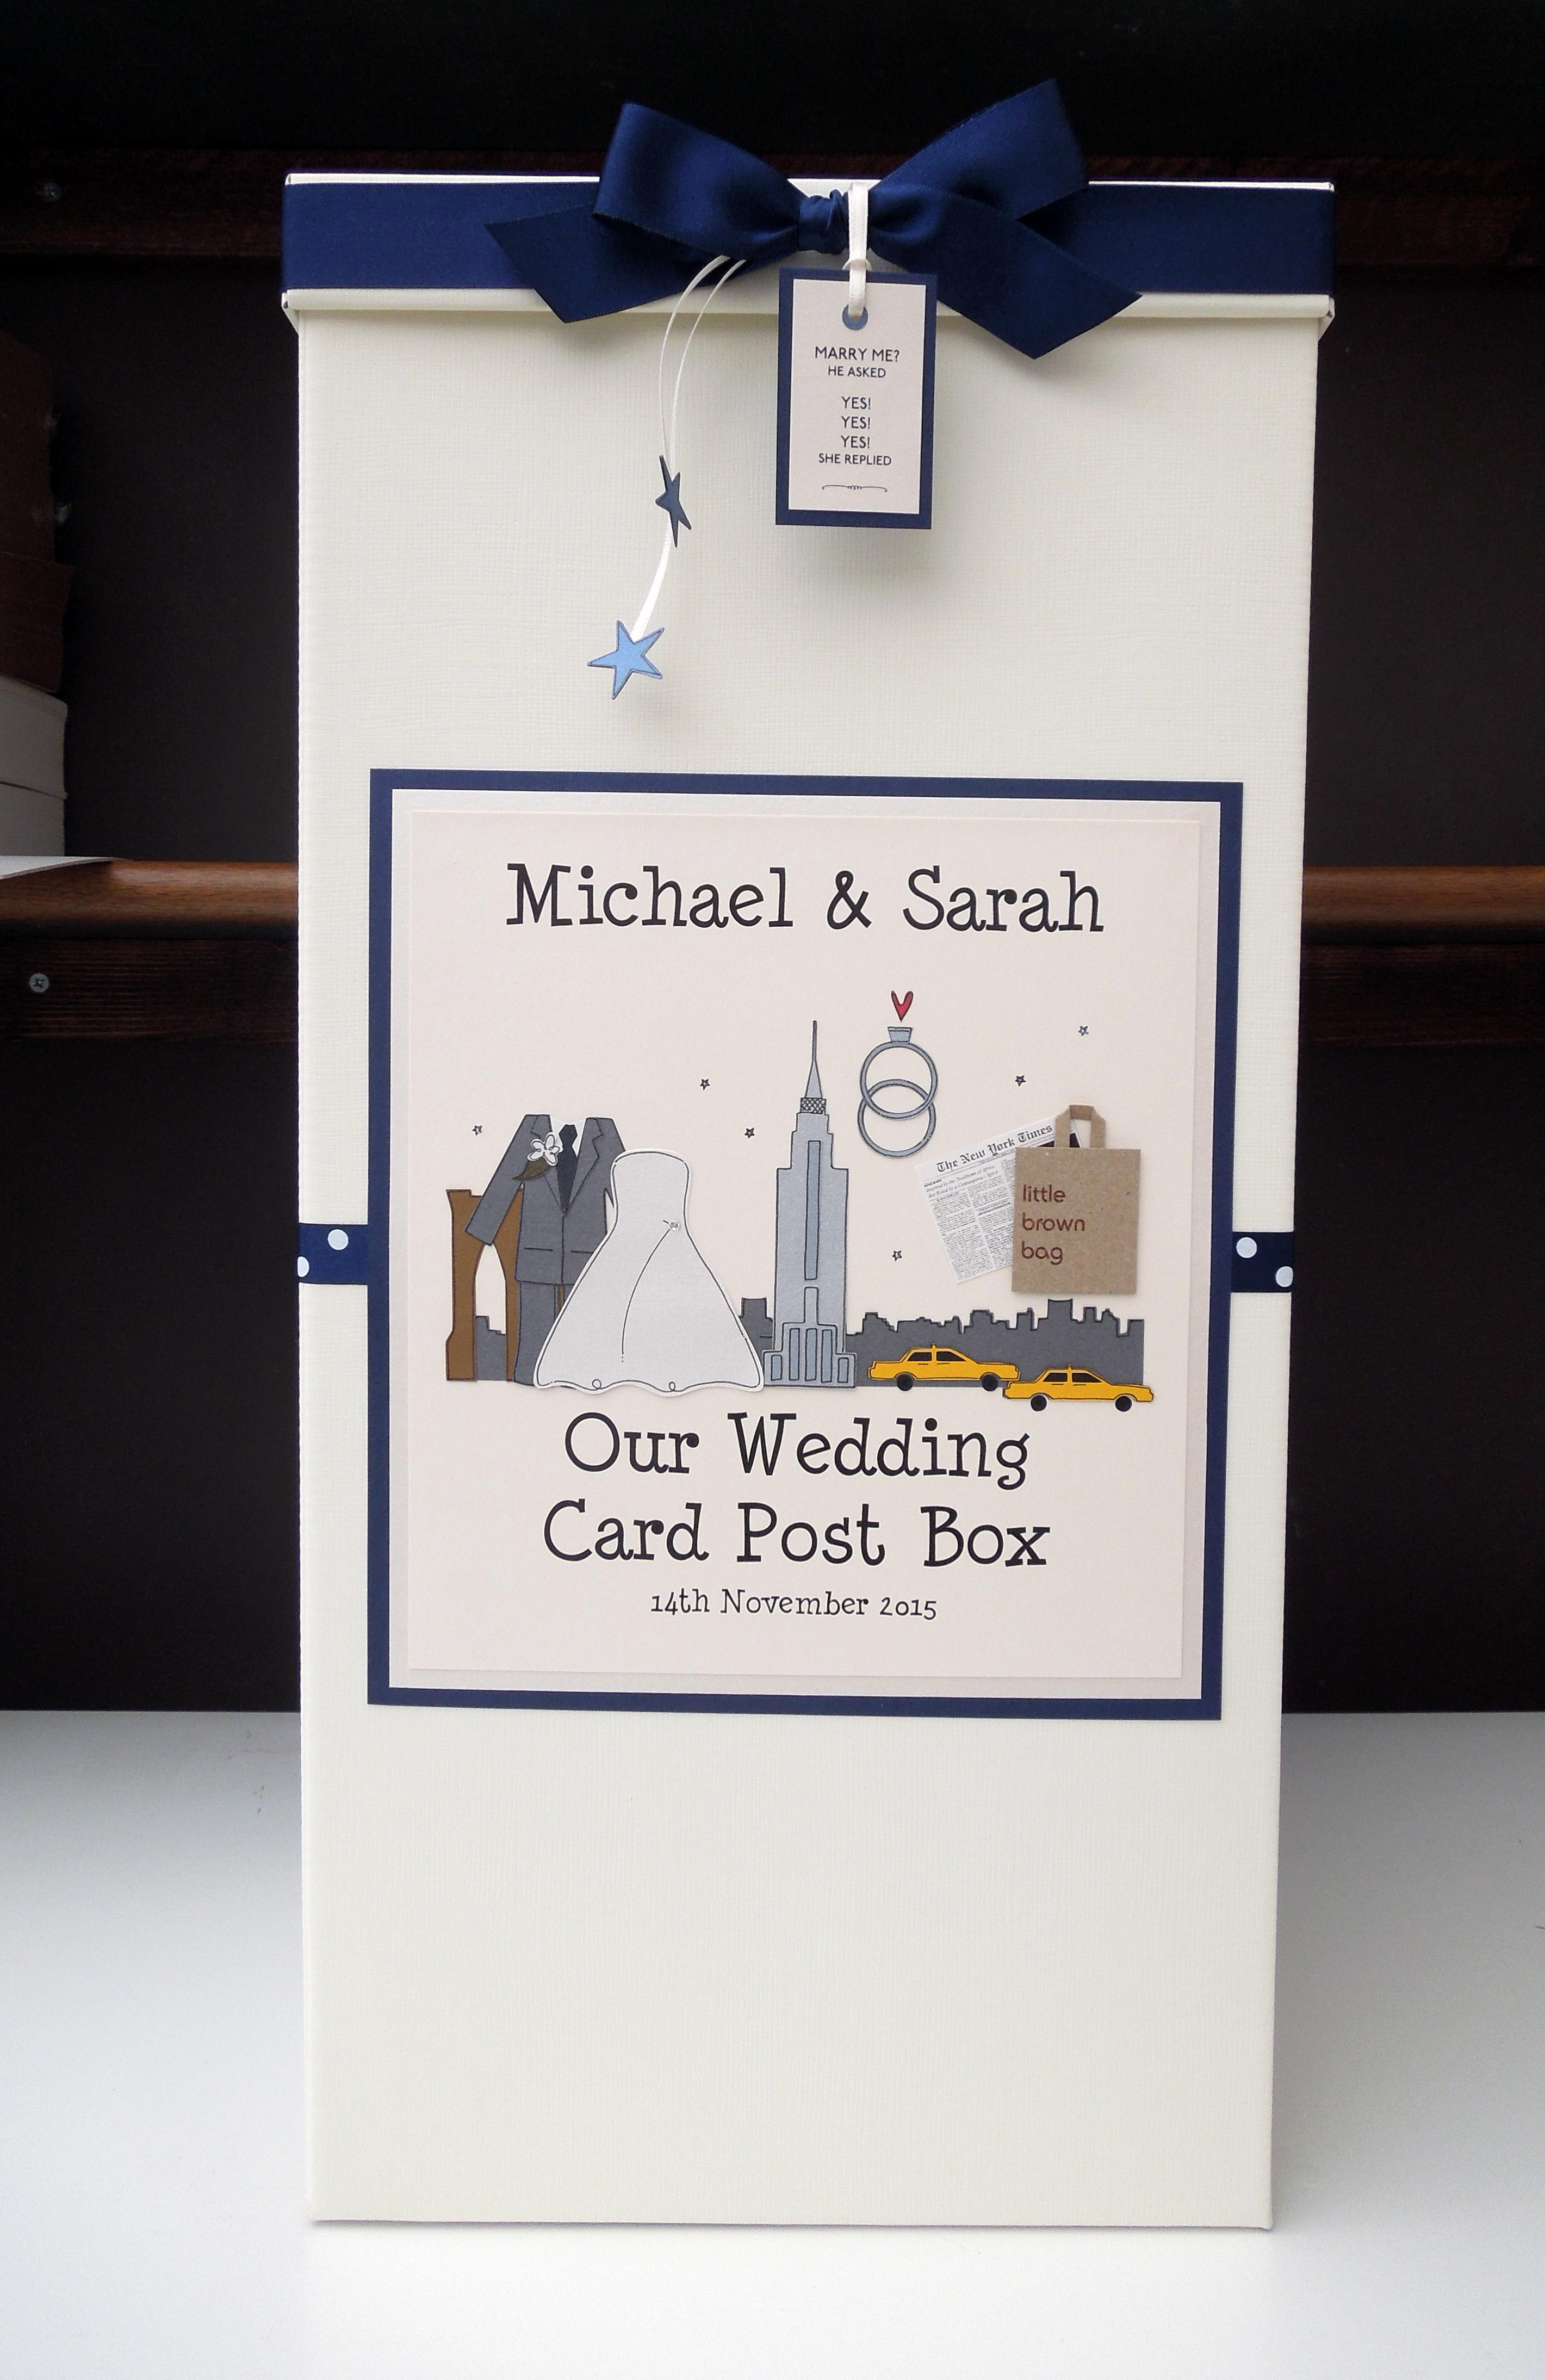 damask wedding invitations michaels michaels wedding invites diy wedding invitations michaels c new york wedding card post box